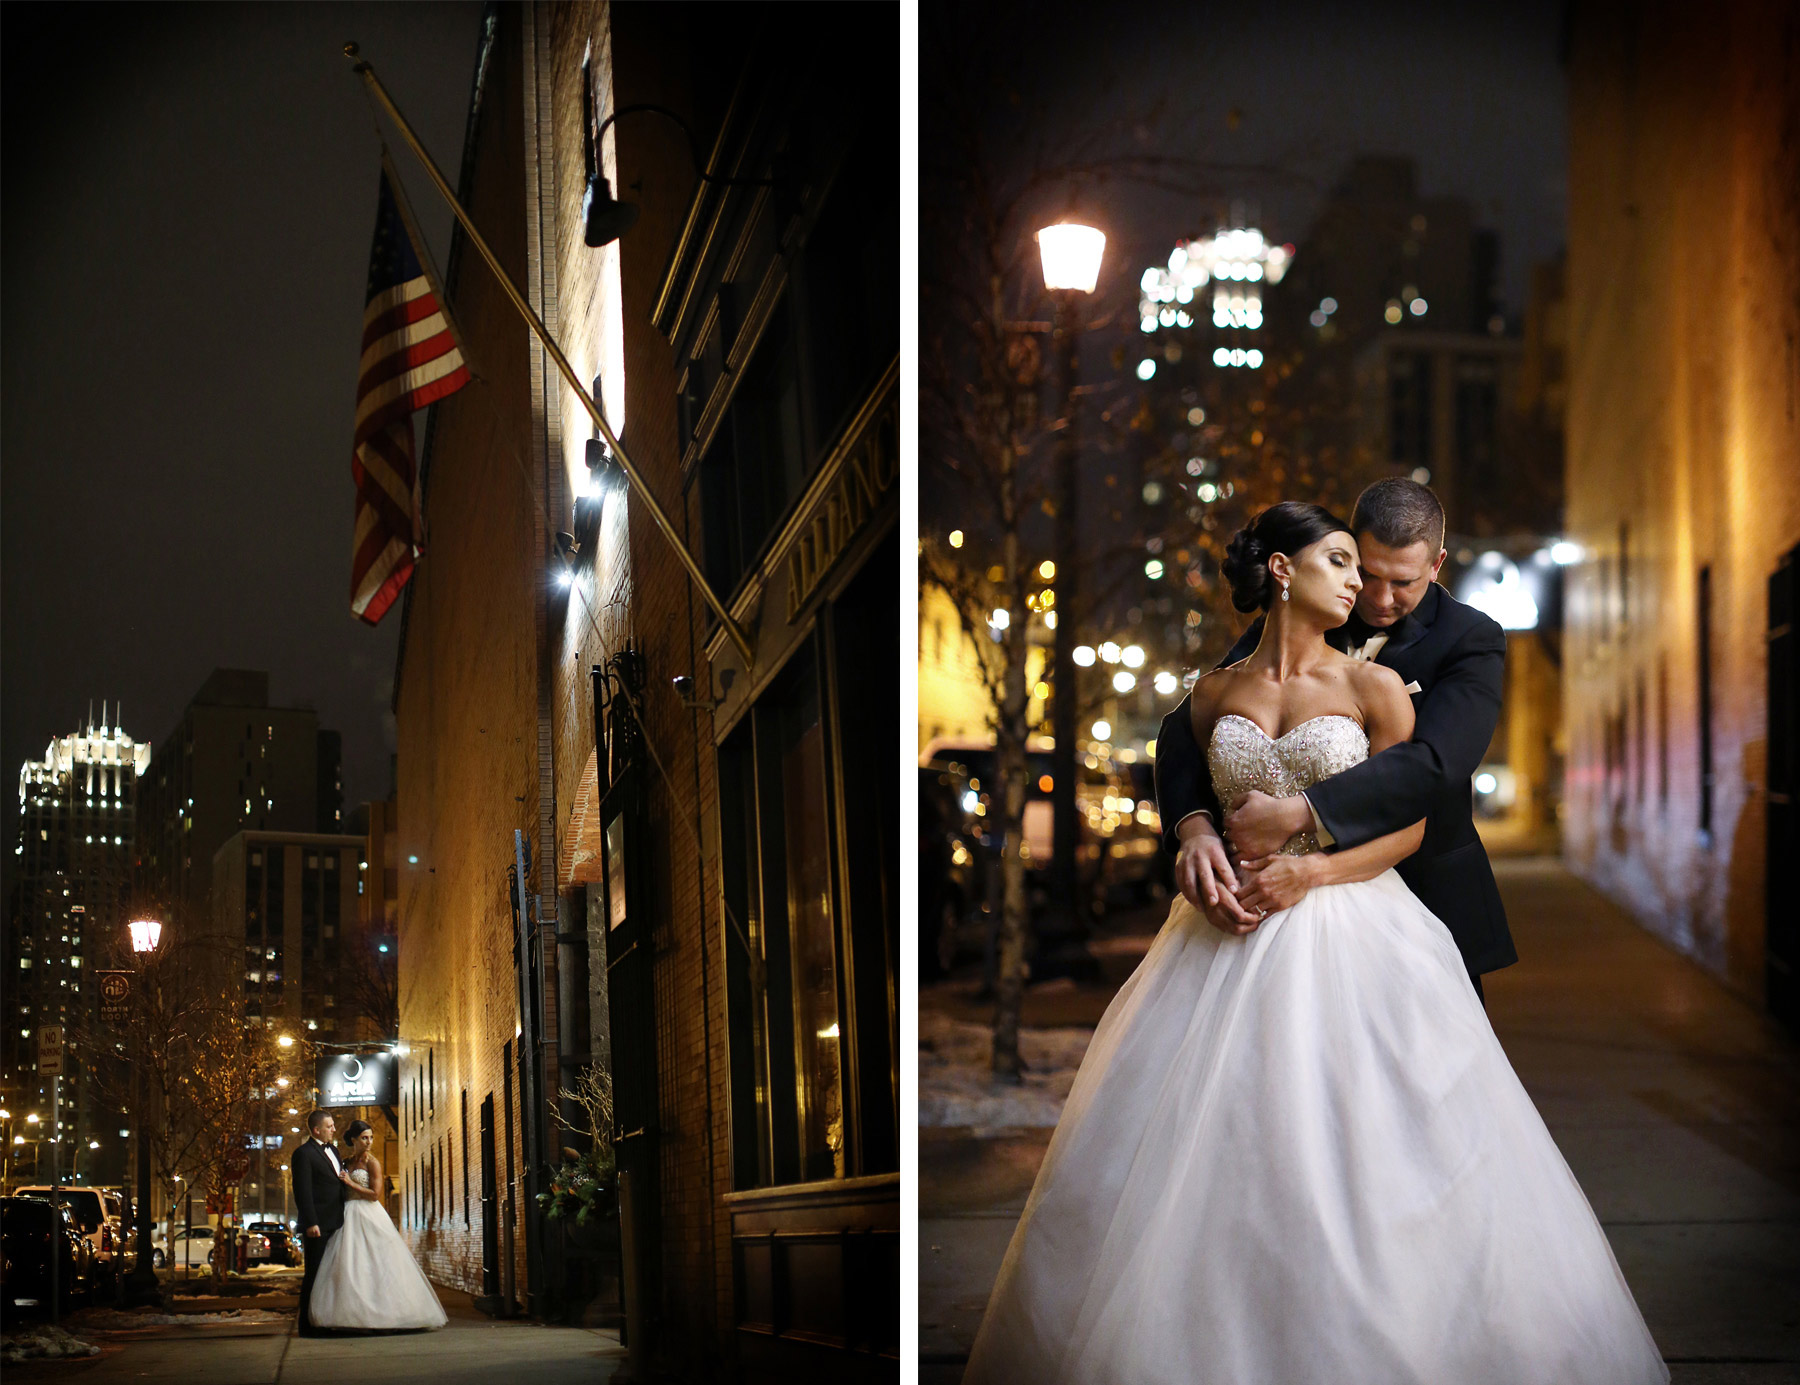 17-Minneapolis-Minnesota-Wedding-Photography-Aria-Downtown-Industrial-Skyline-Night-Photography-Melanie-and-Andrew.jpg